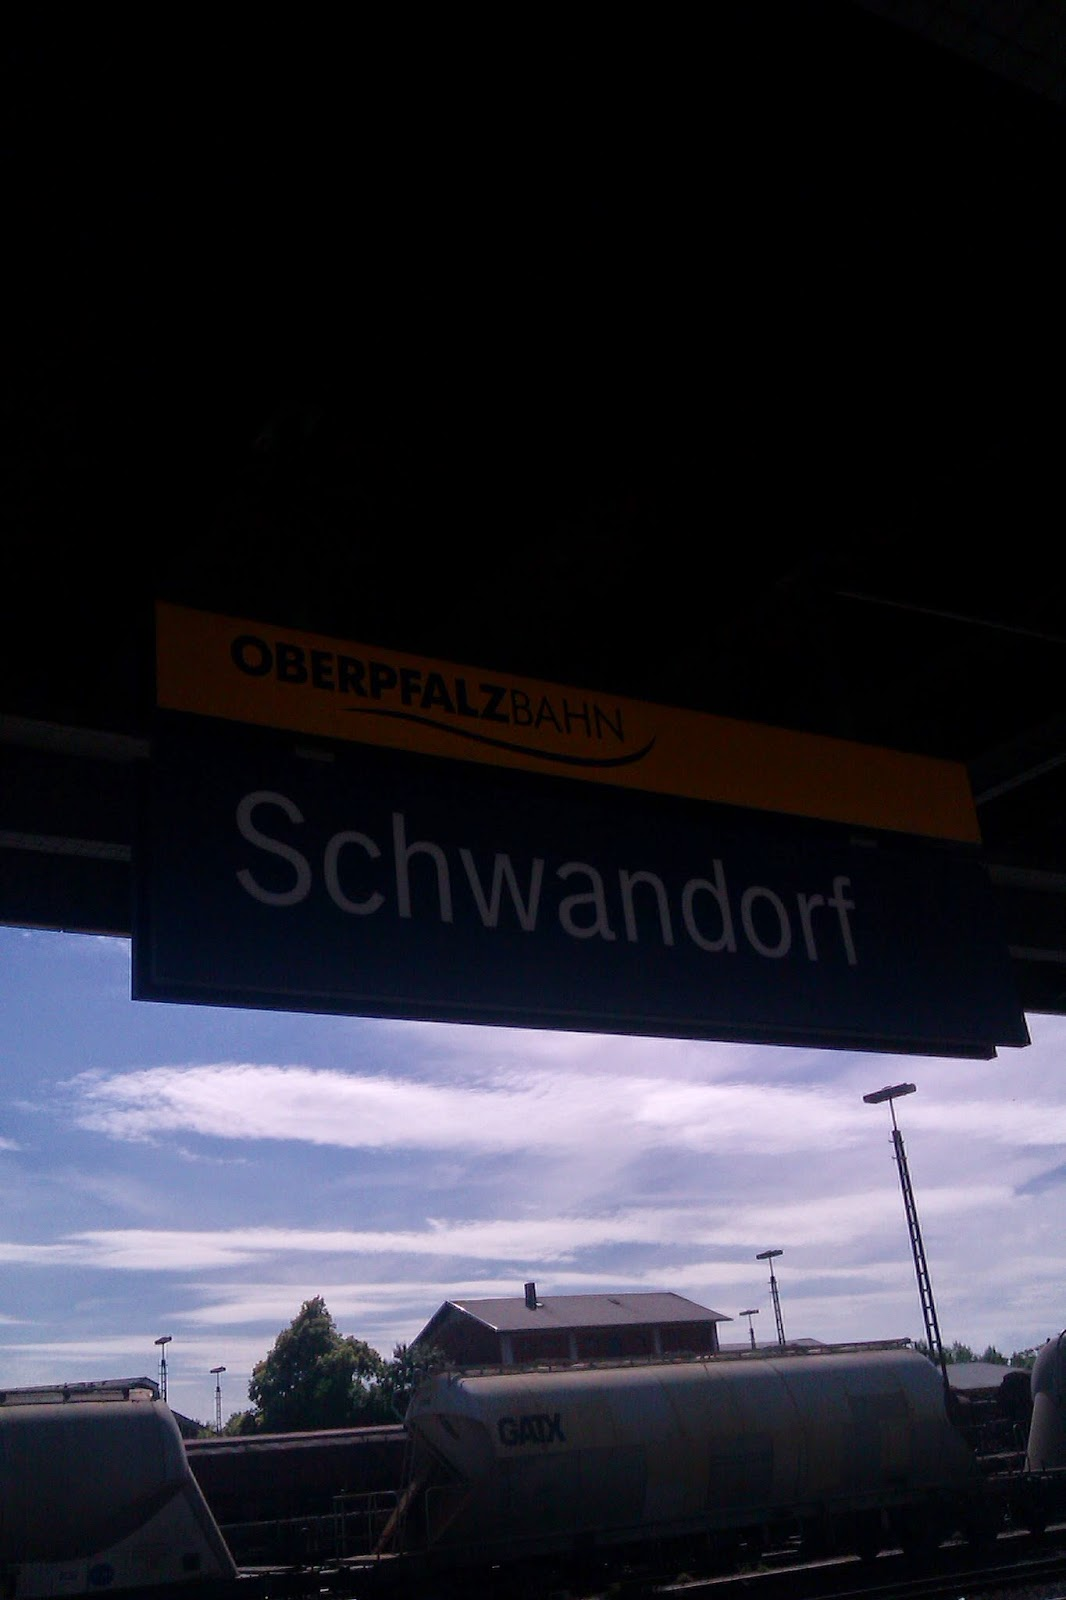 Zug Schwandorf Regensburg